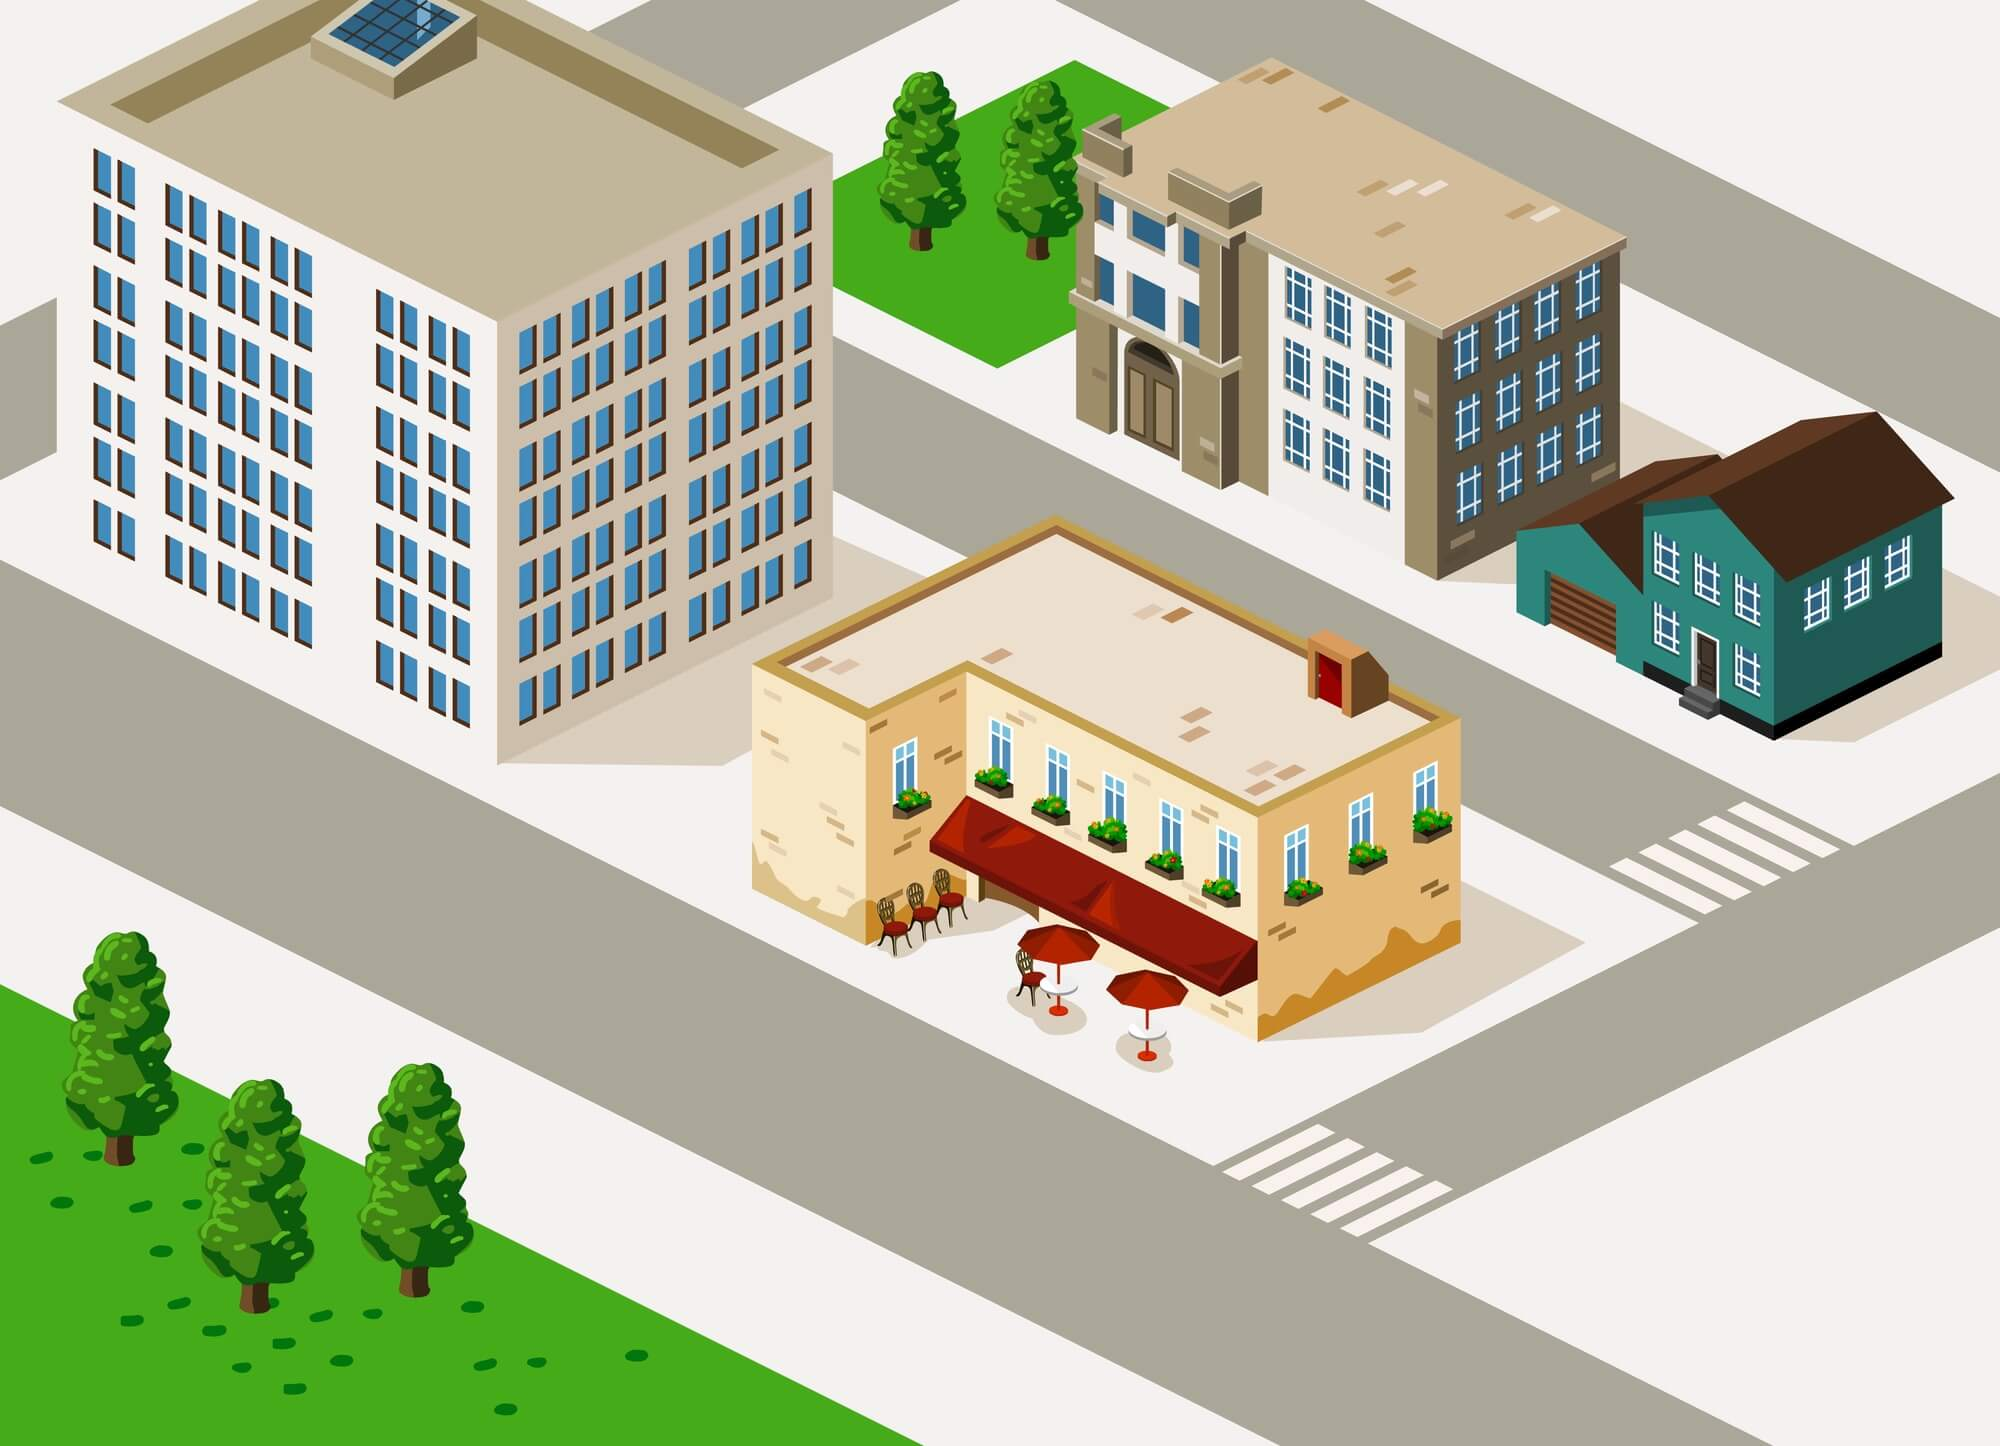 bird's-eye view of illustrated buildings on street corner